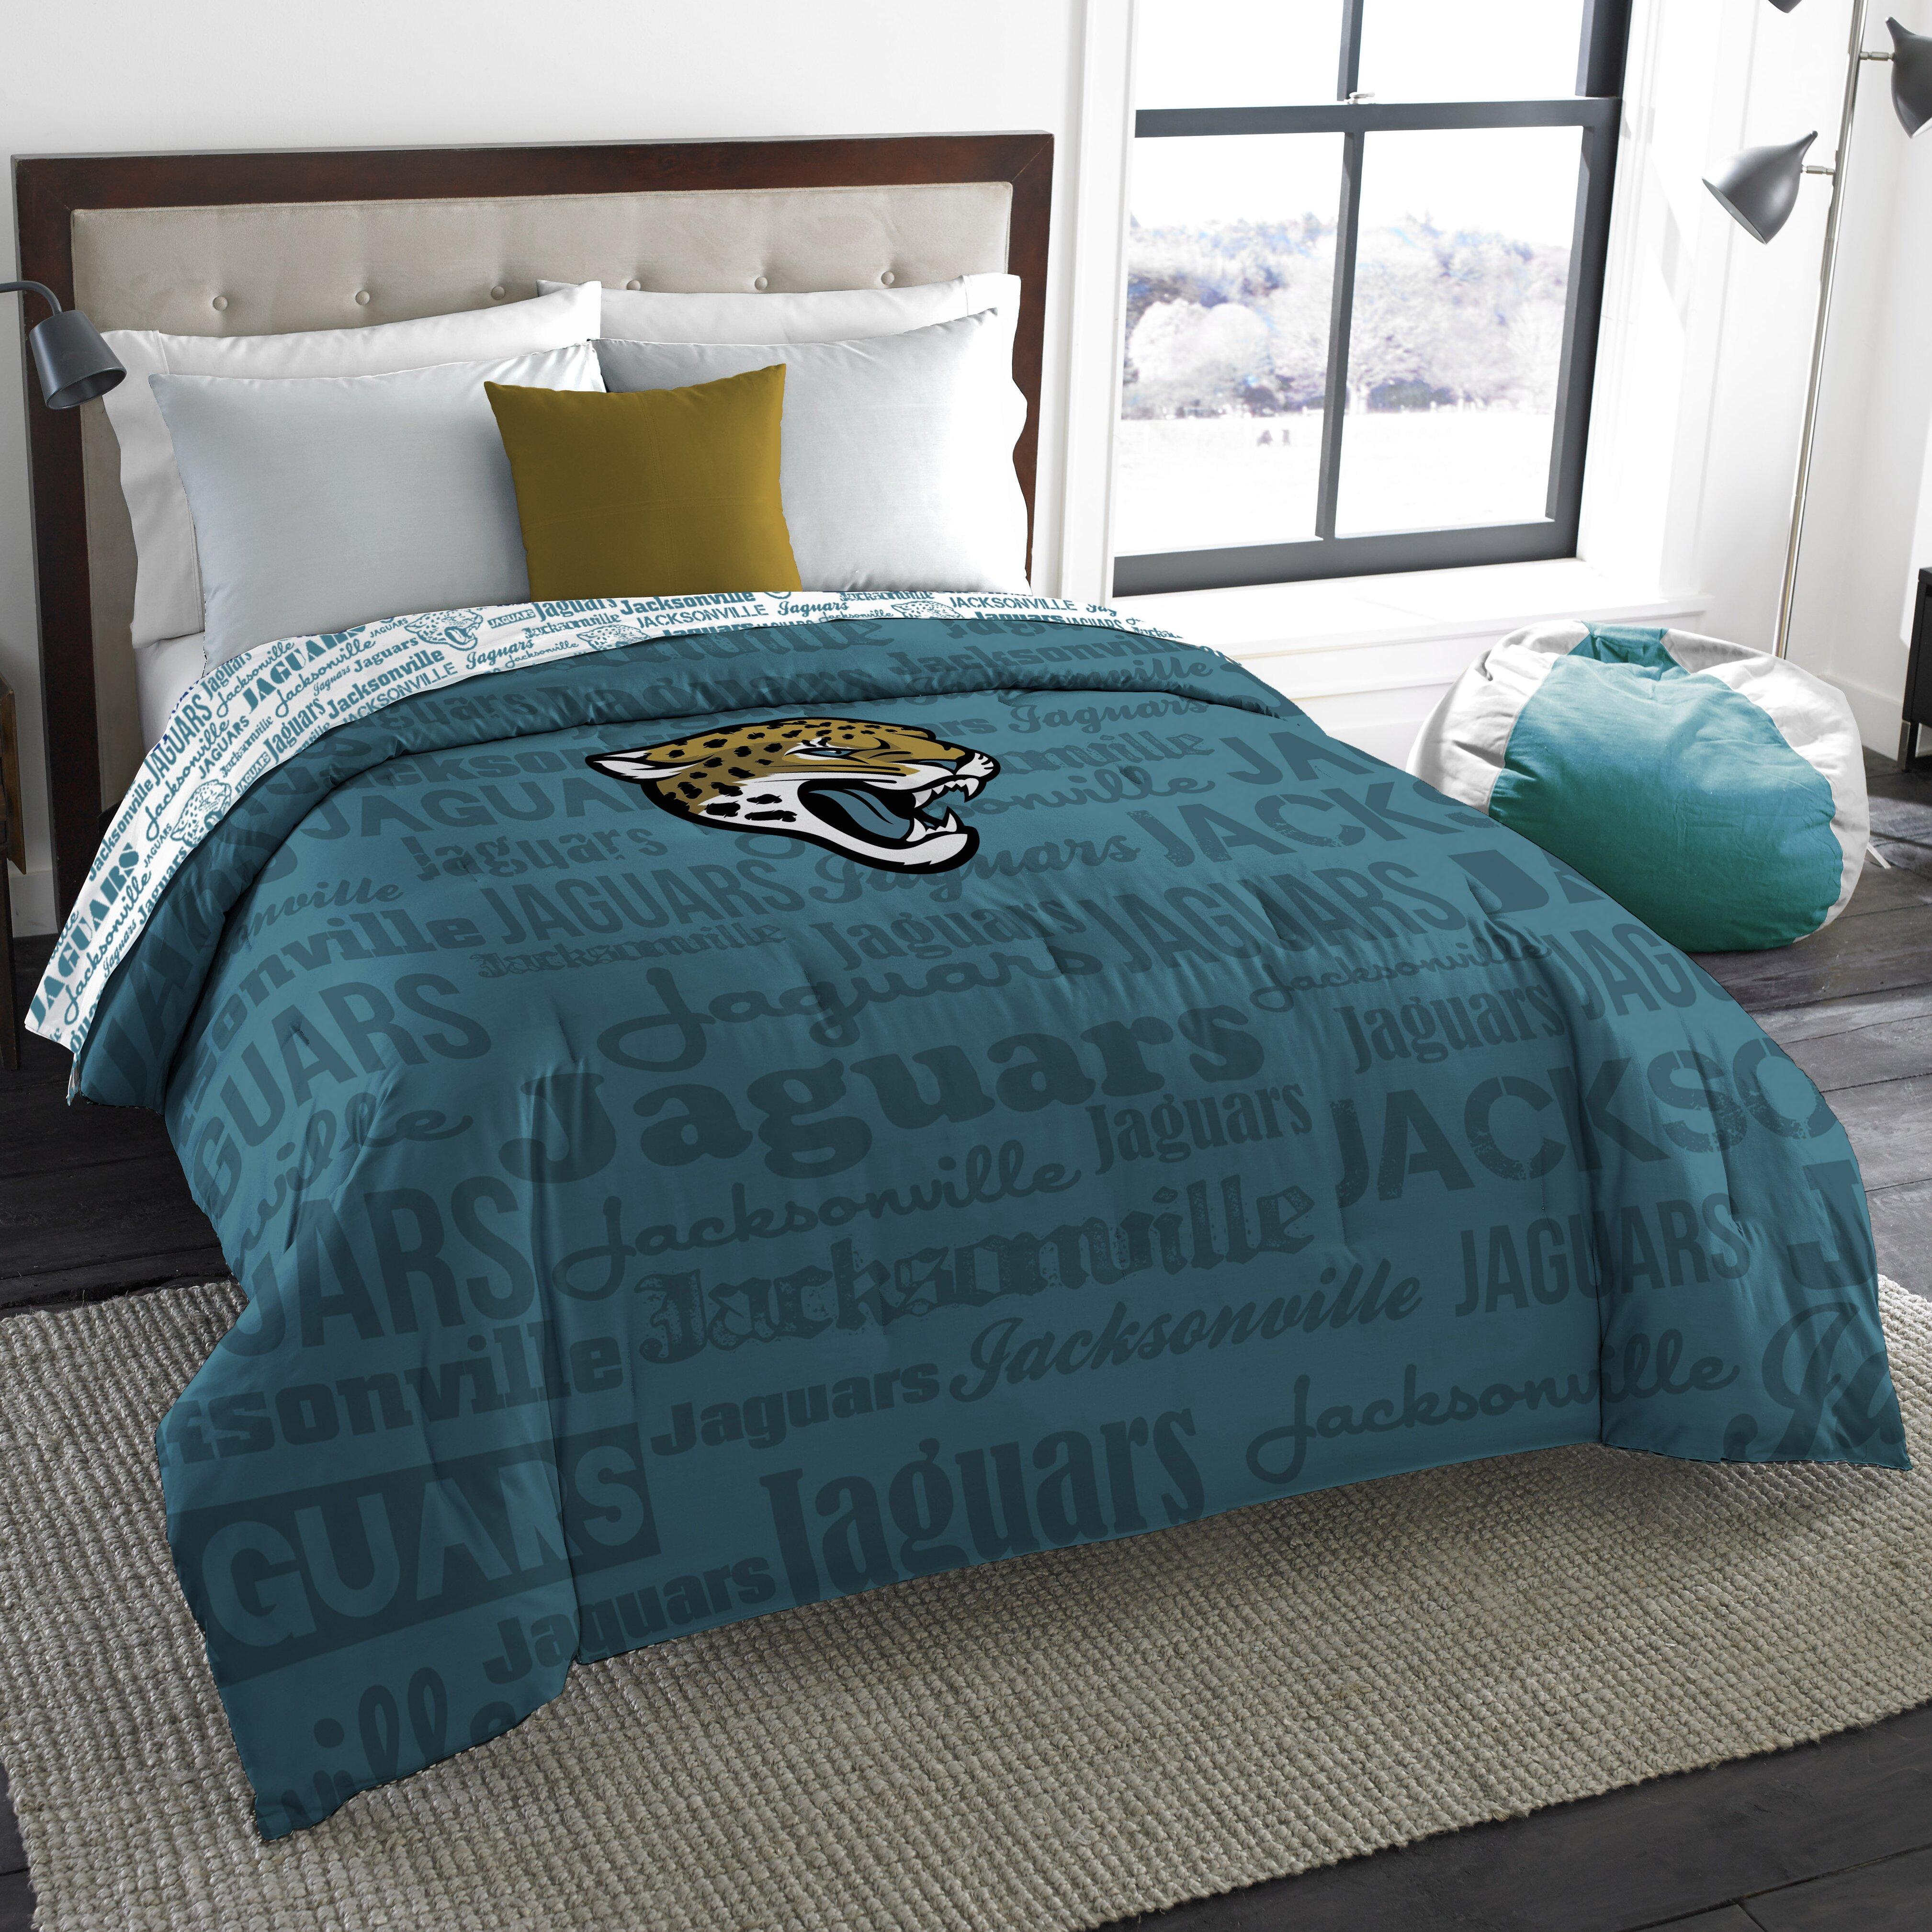 cover ecru cm com bedding blue beige bed duvet marimekko unikko en